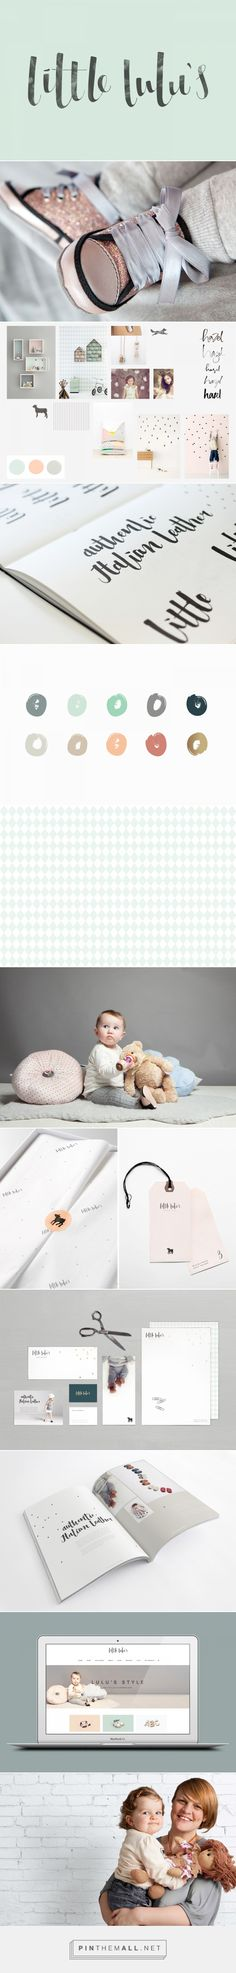 Little Lulu's | Graphic design agency | Tonik - created https://brandingbytonik.co.uk/